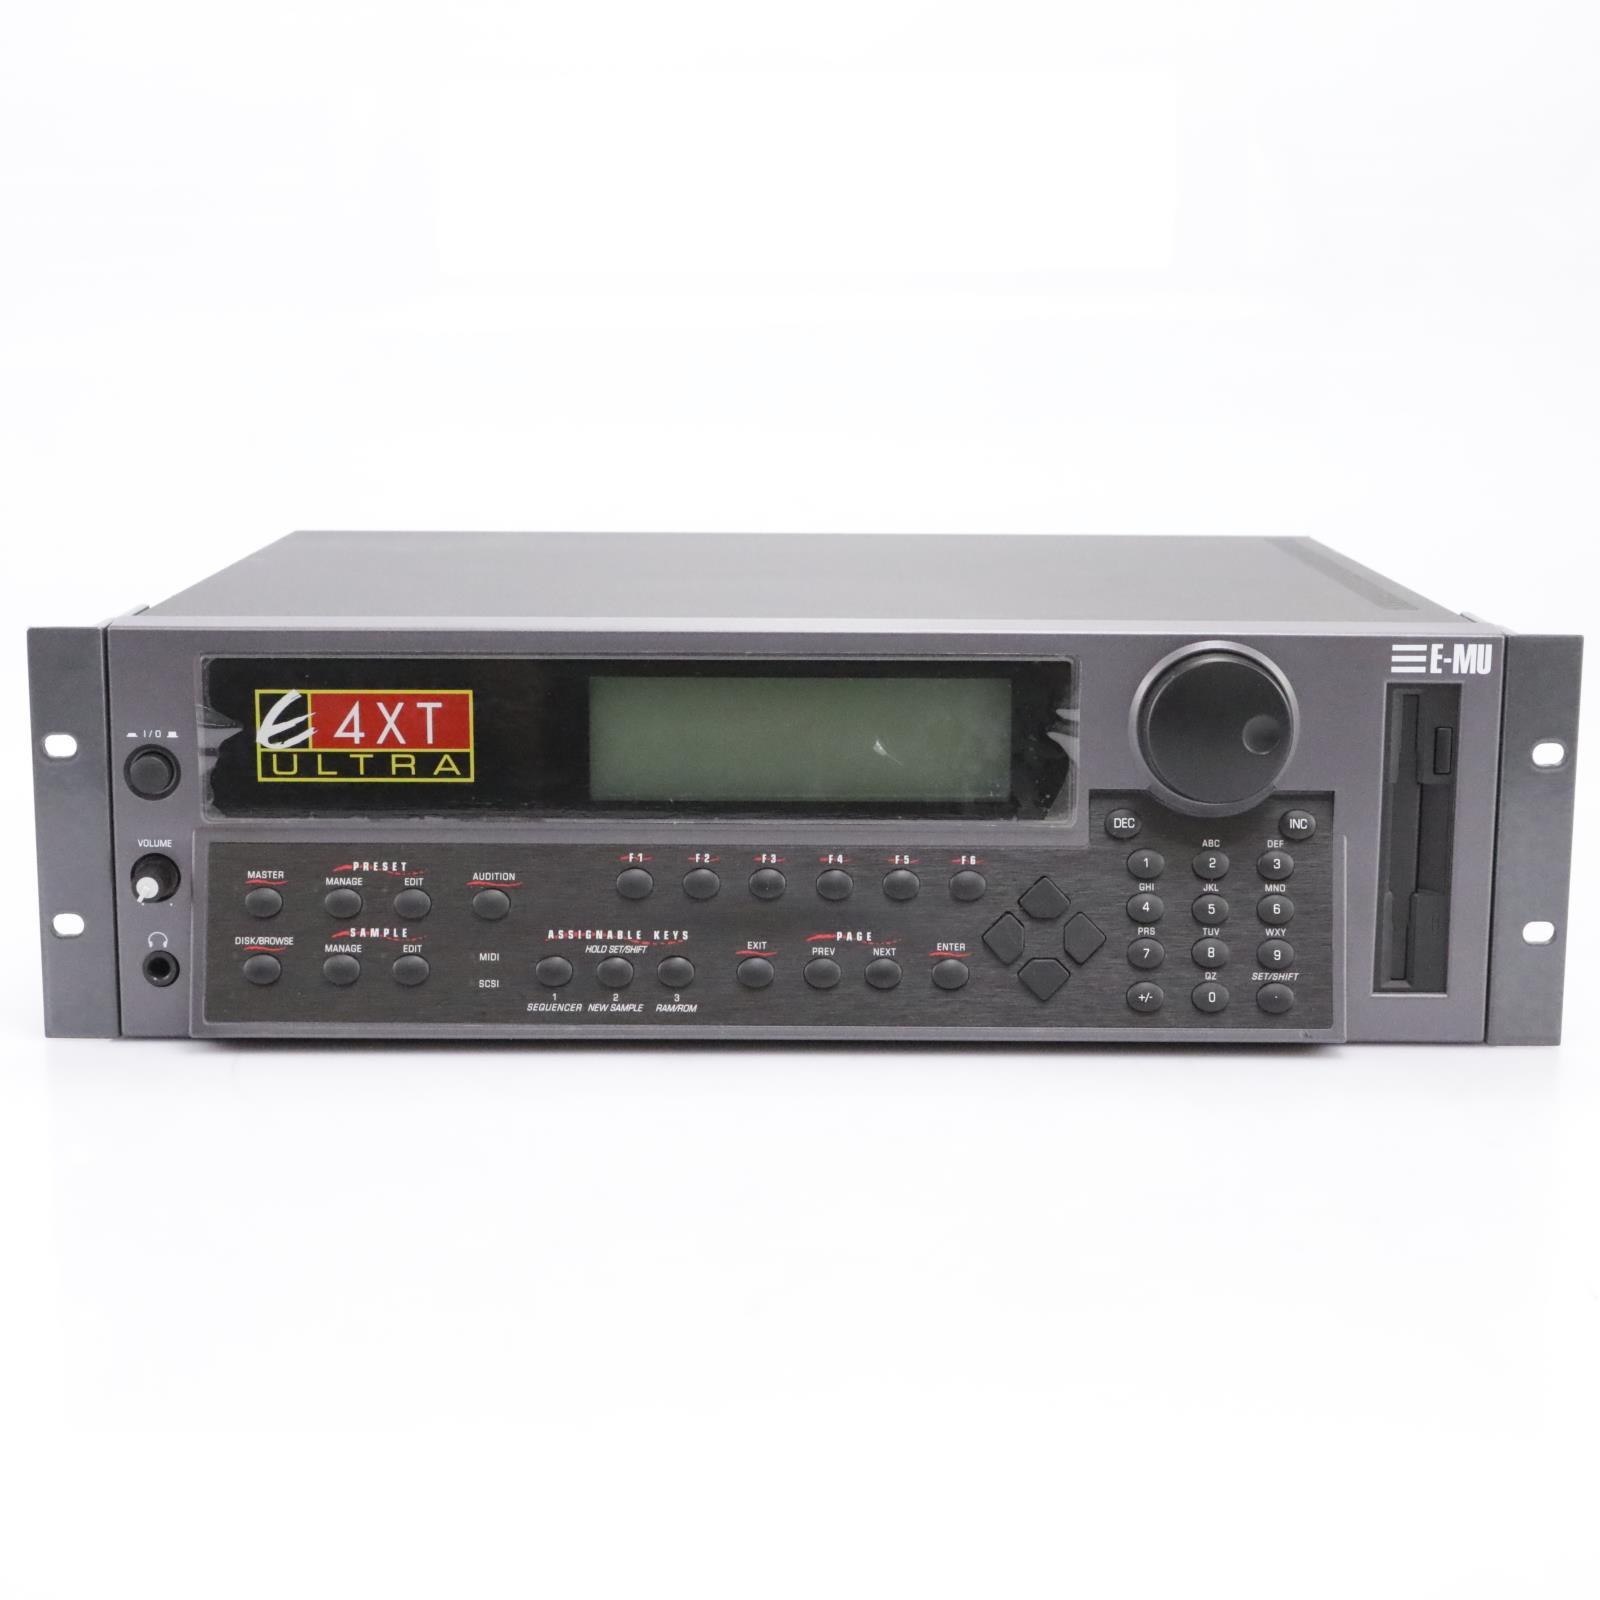 E-MU Systems E4XT Ultra Sampler Rack Module #43740